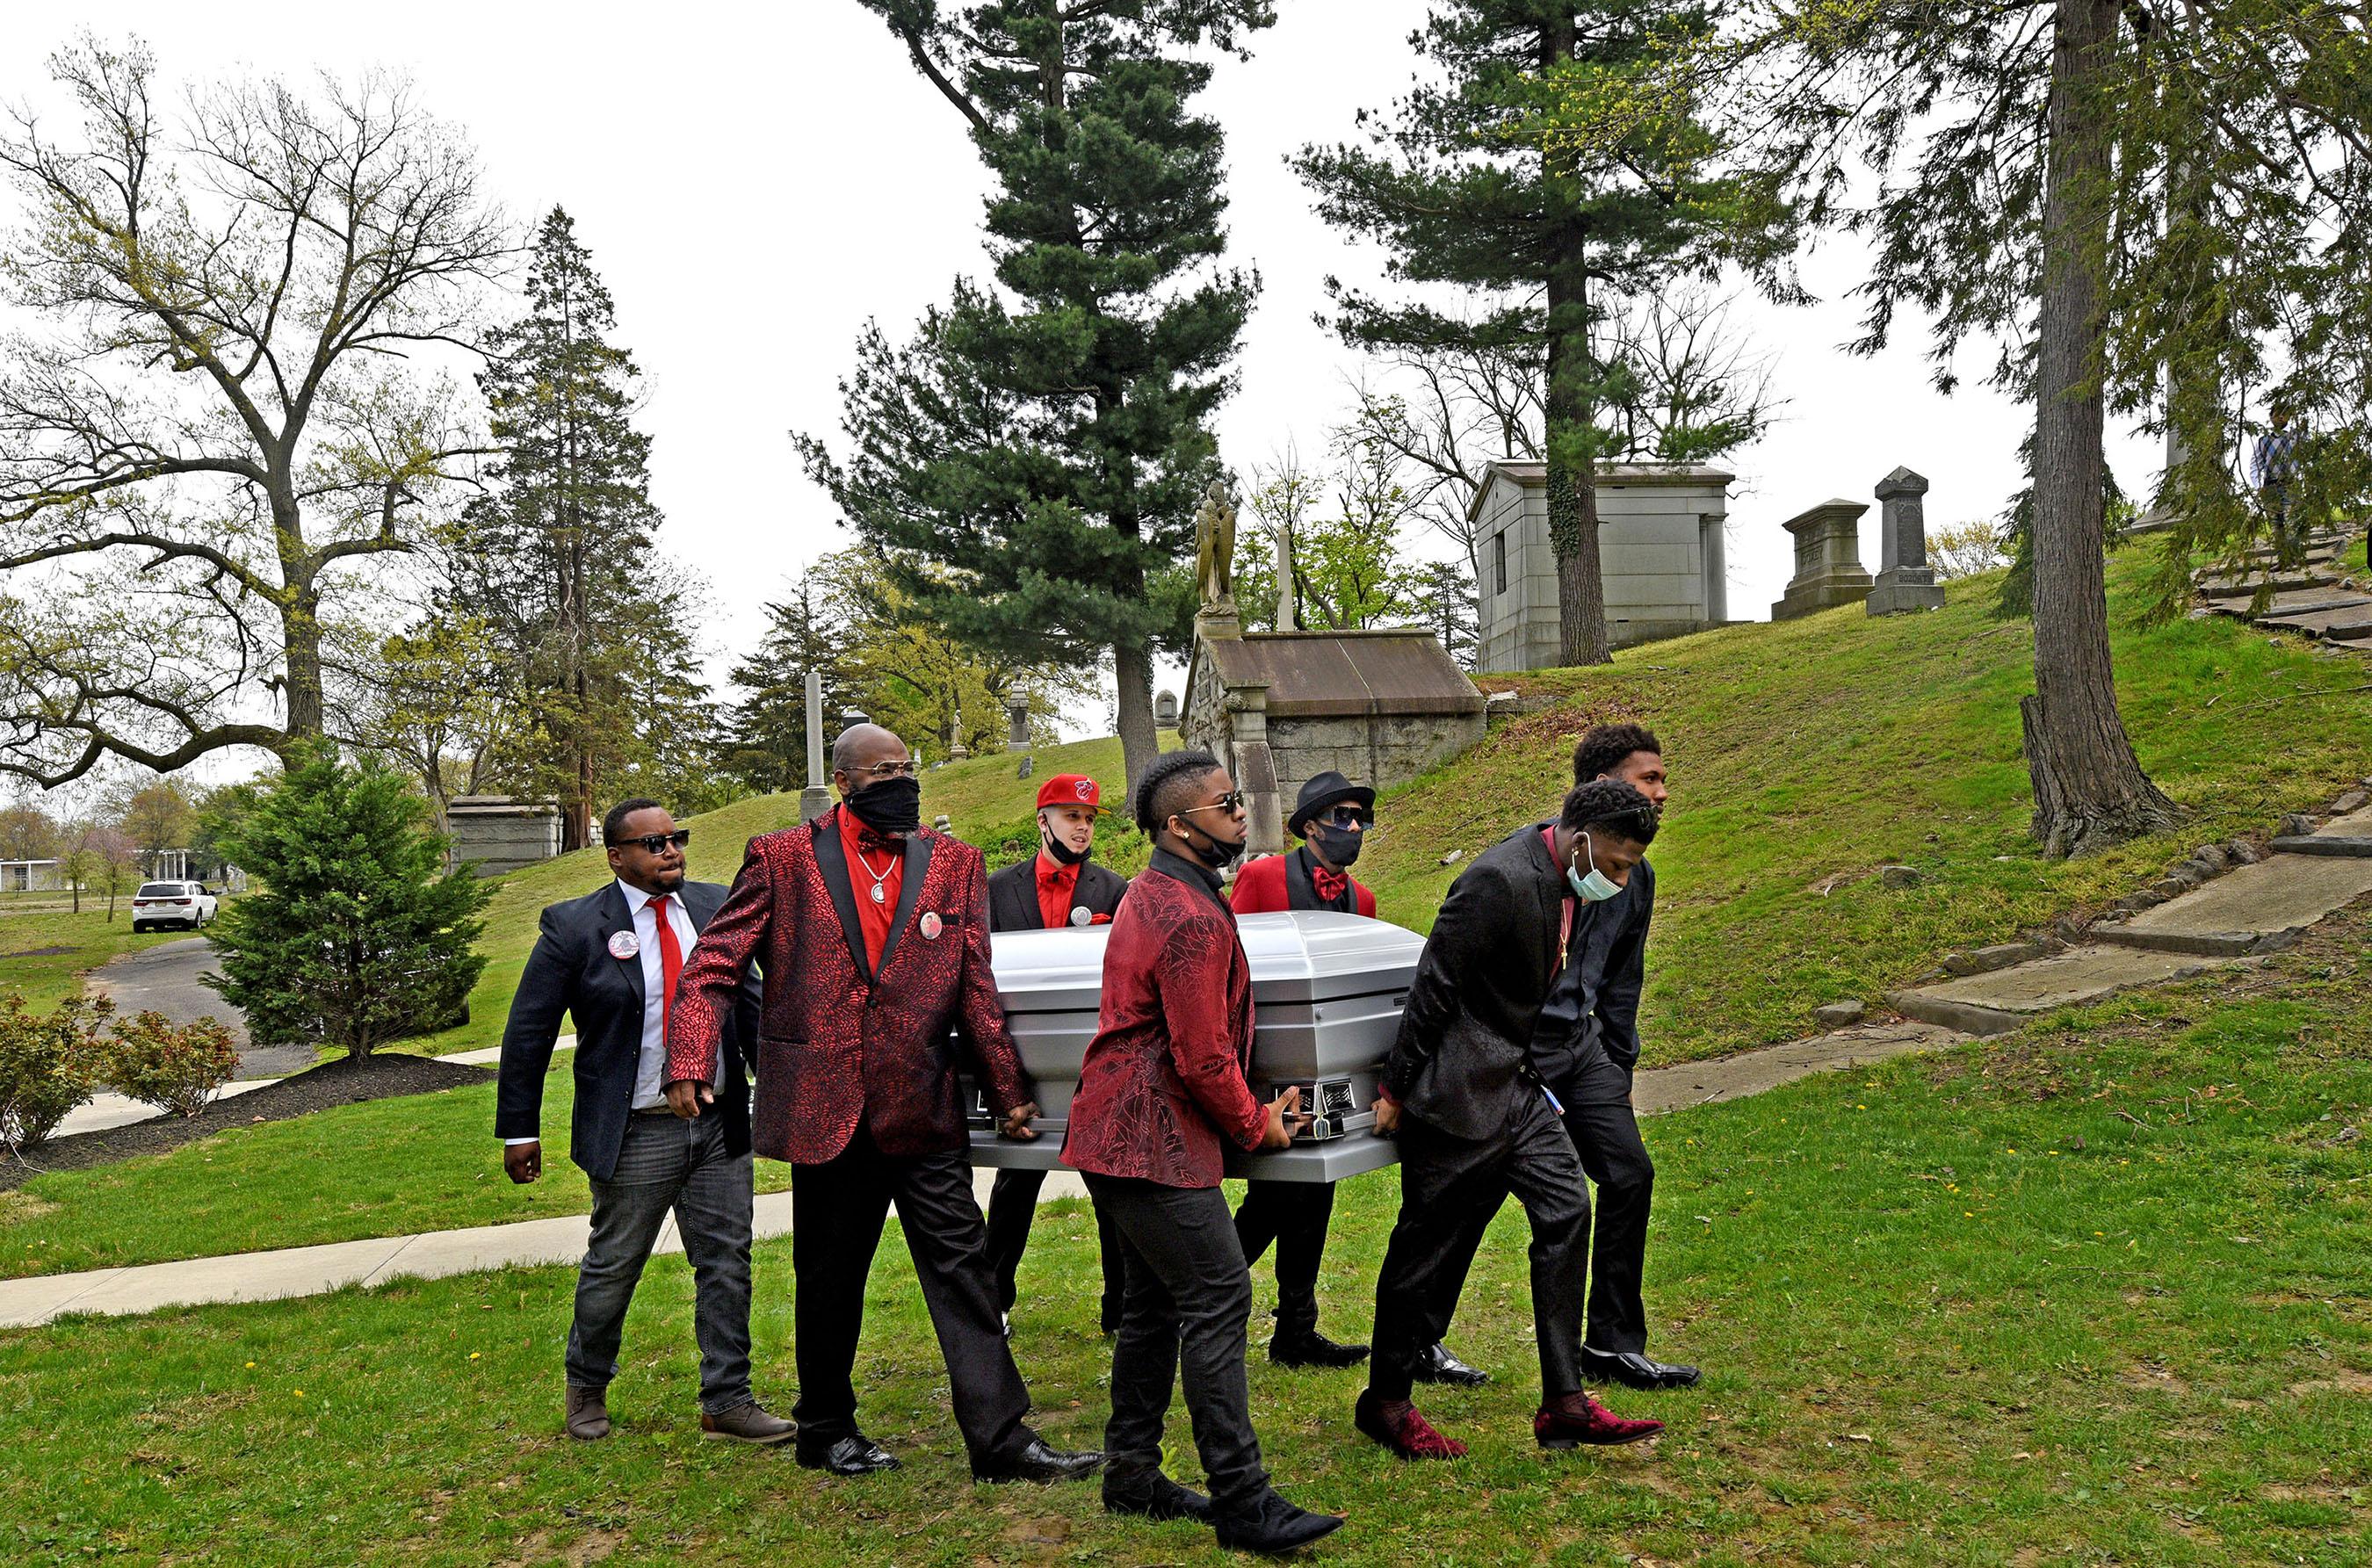 Pallbearers carry the casket of Nah'Jole Frazier